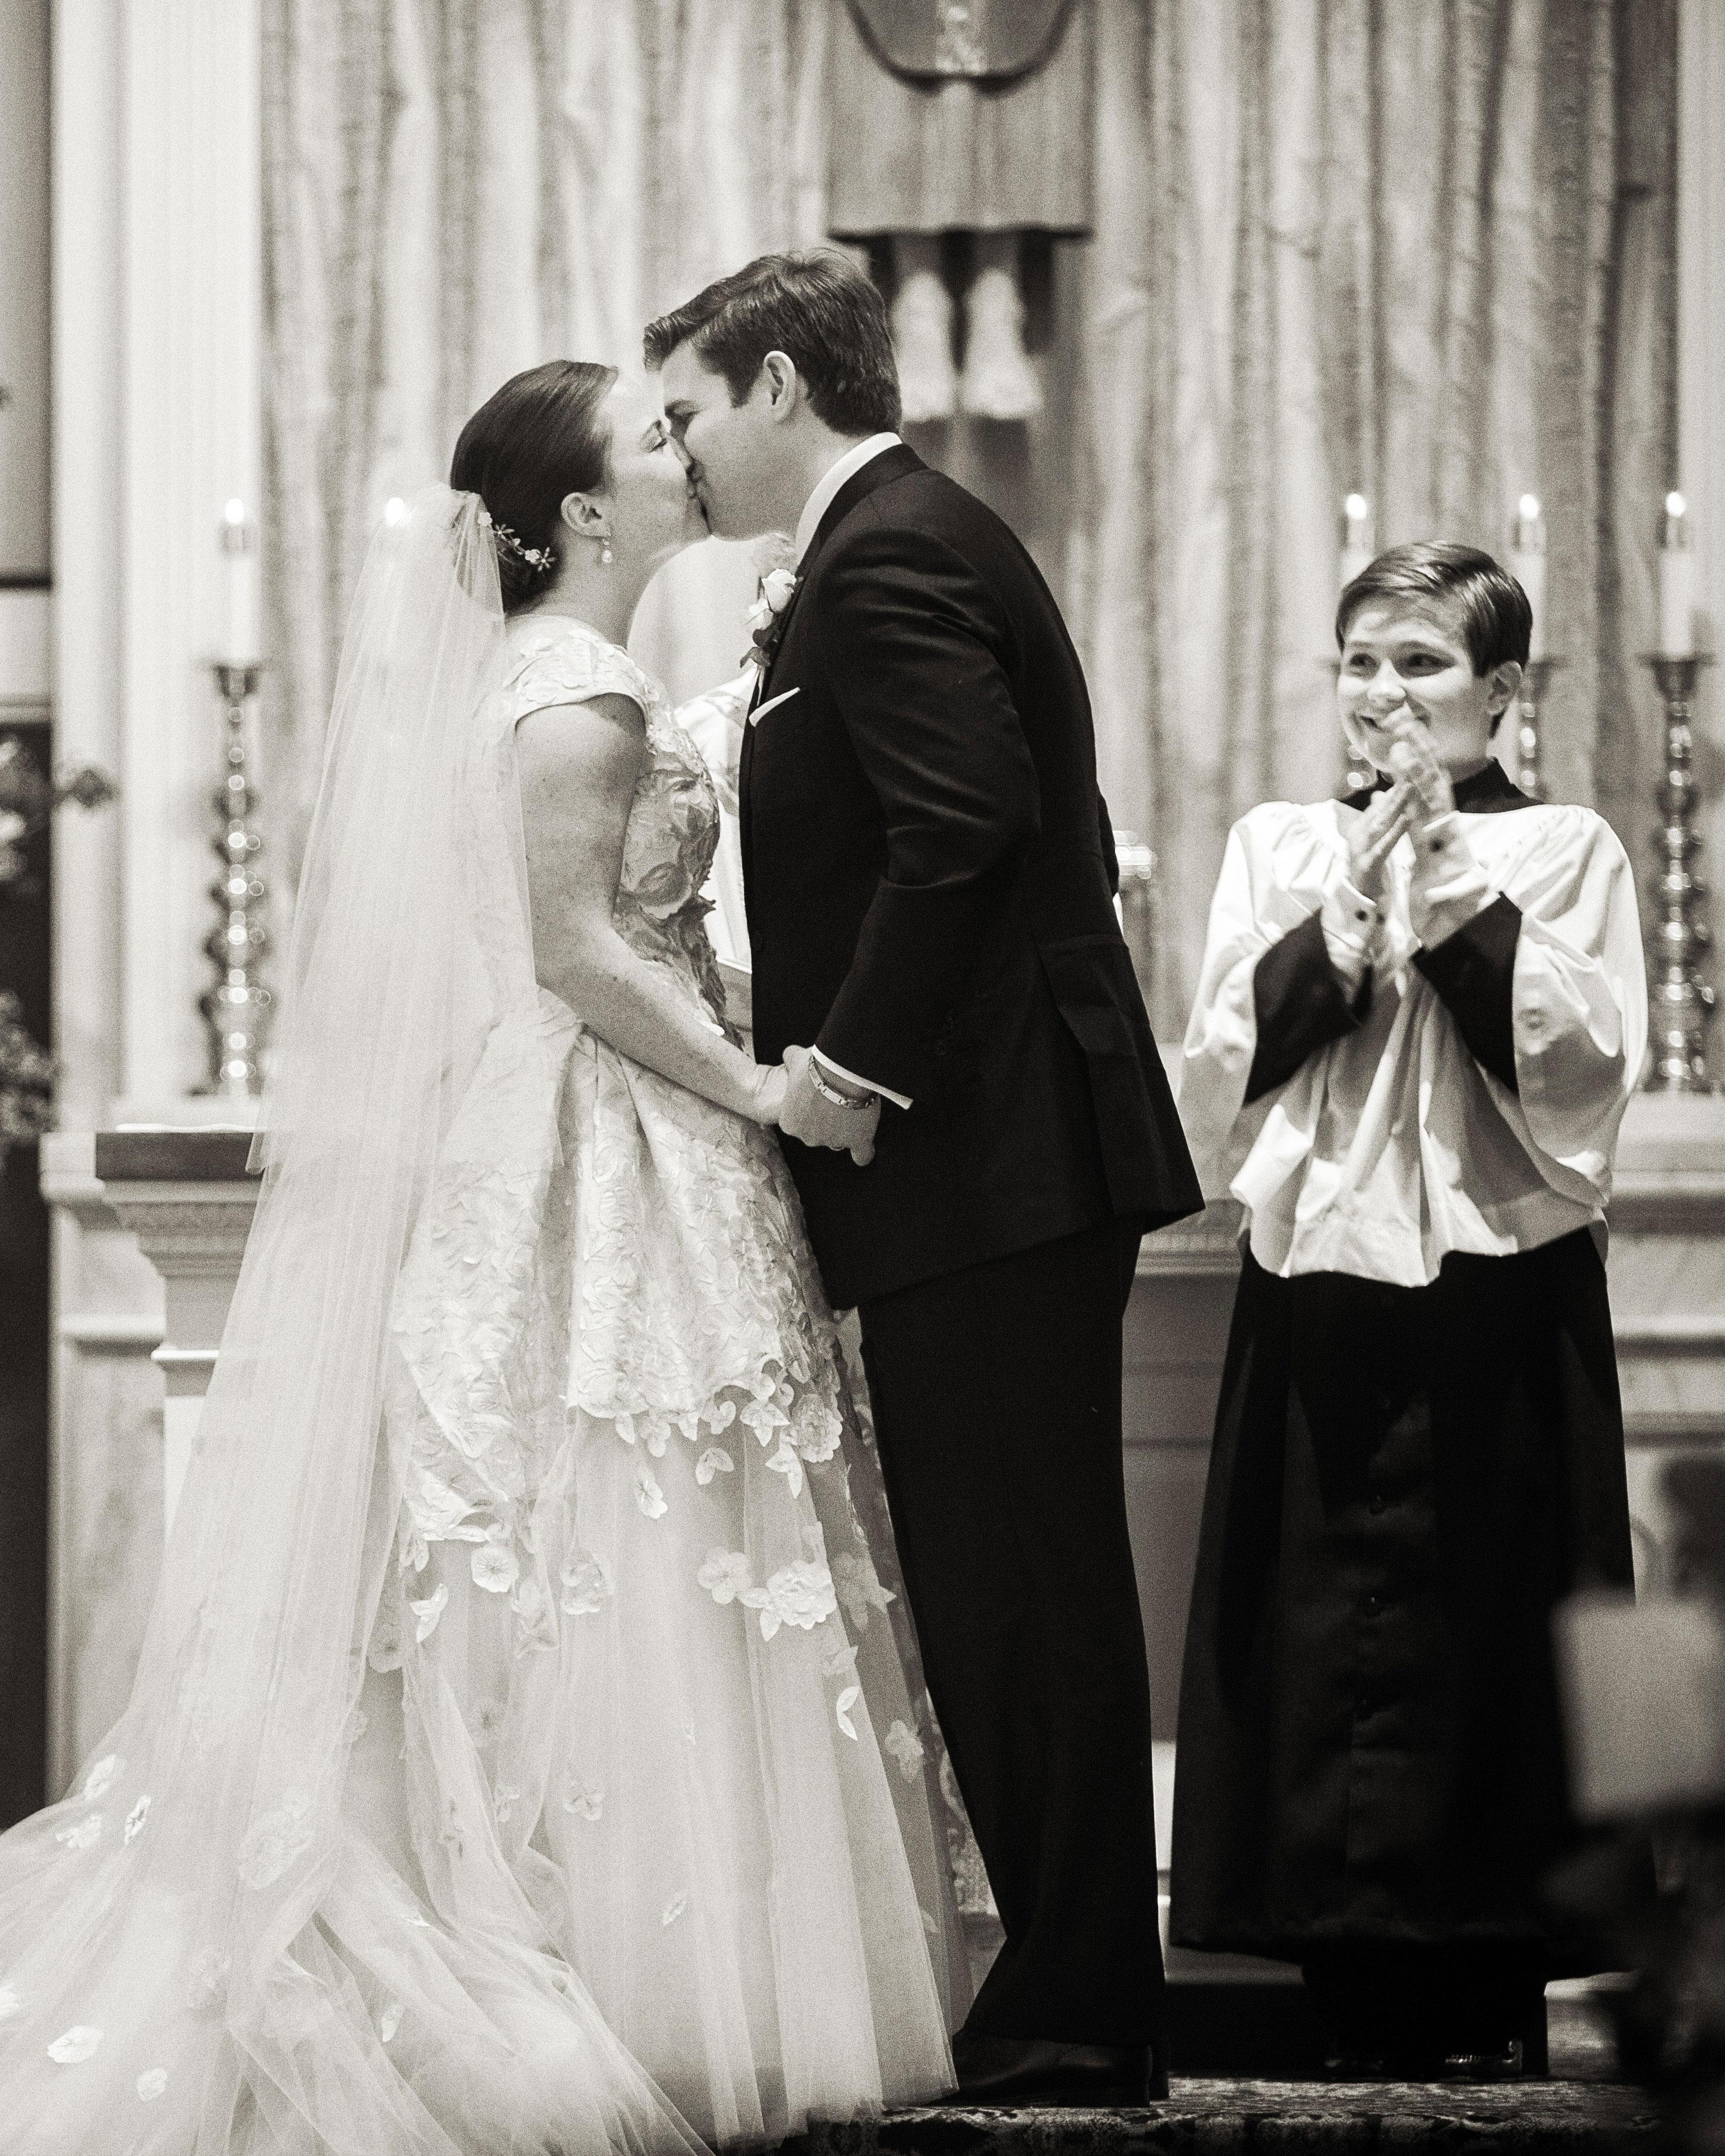 emily-matthew-wedding-ceremony-kiss-0077-s112720-0316.jpg